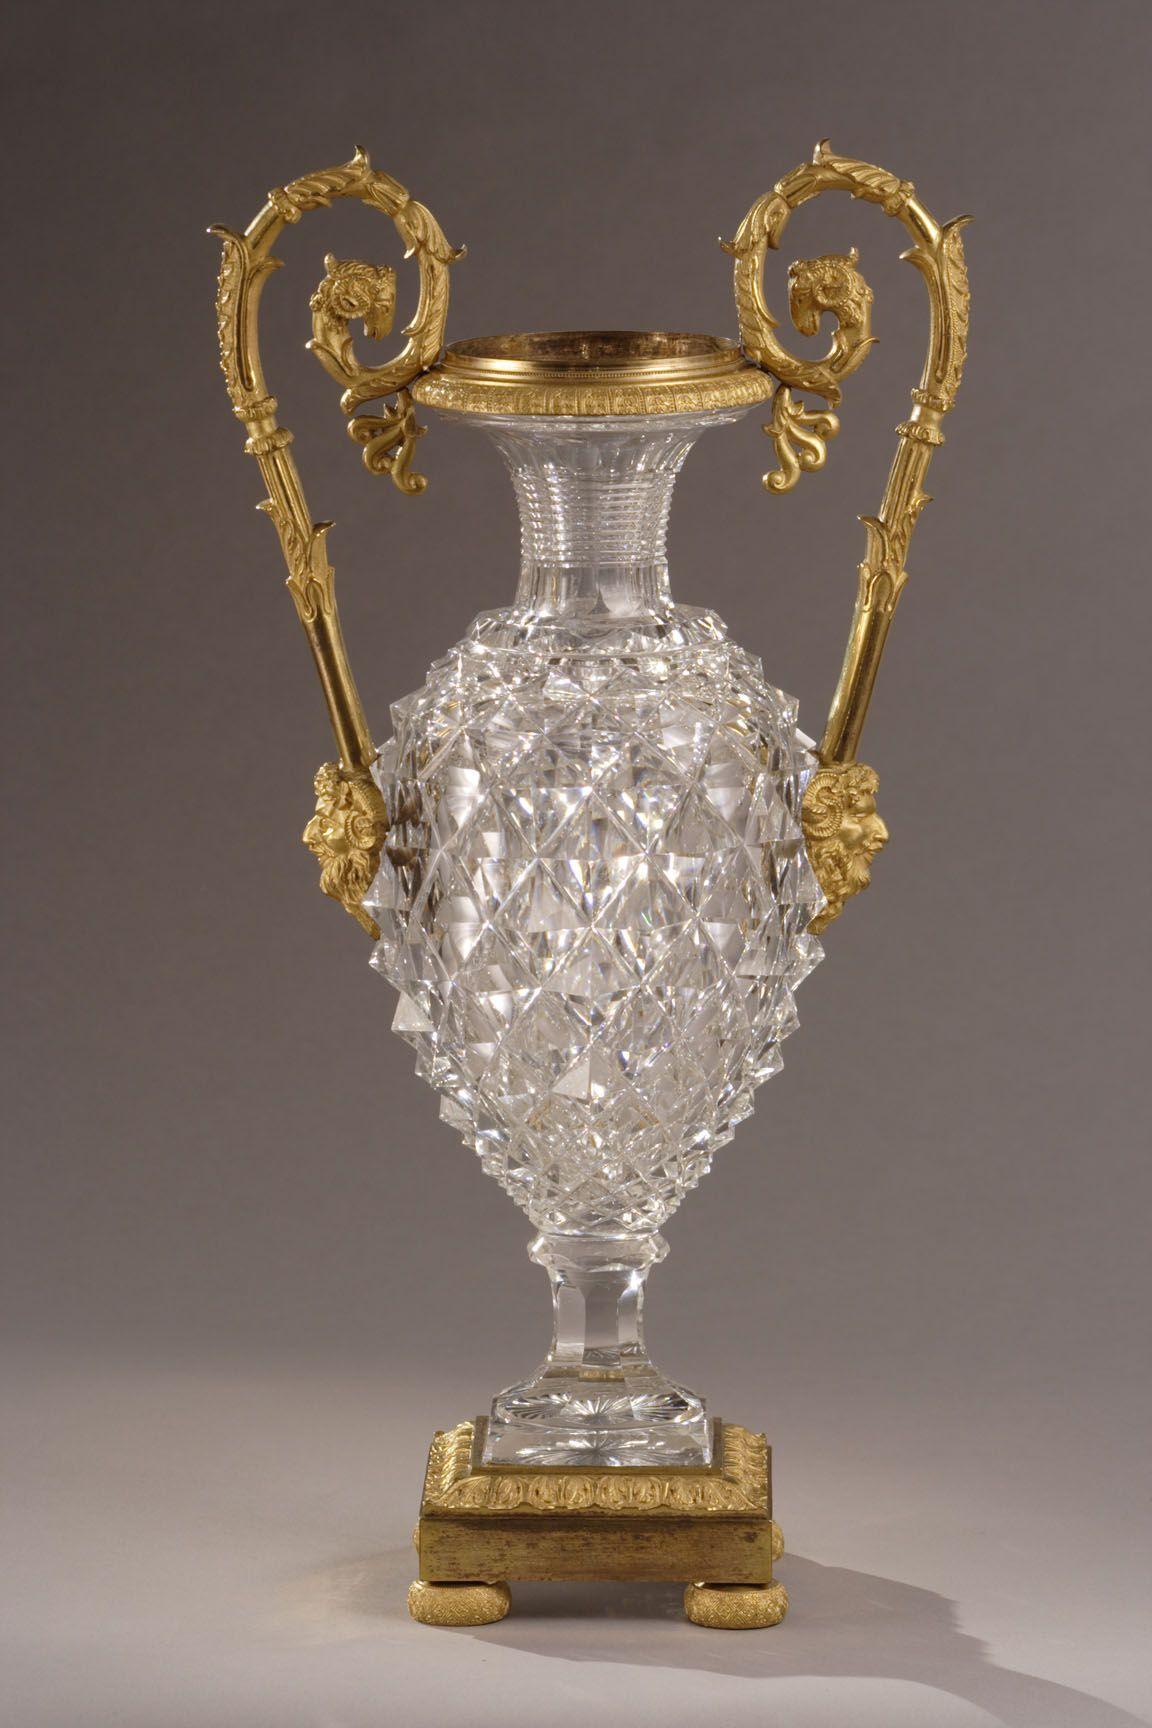 A Cut Crystal Vase 1830 Decorative Glass Crystal Vase